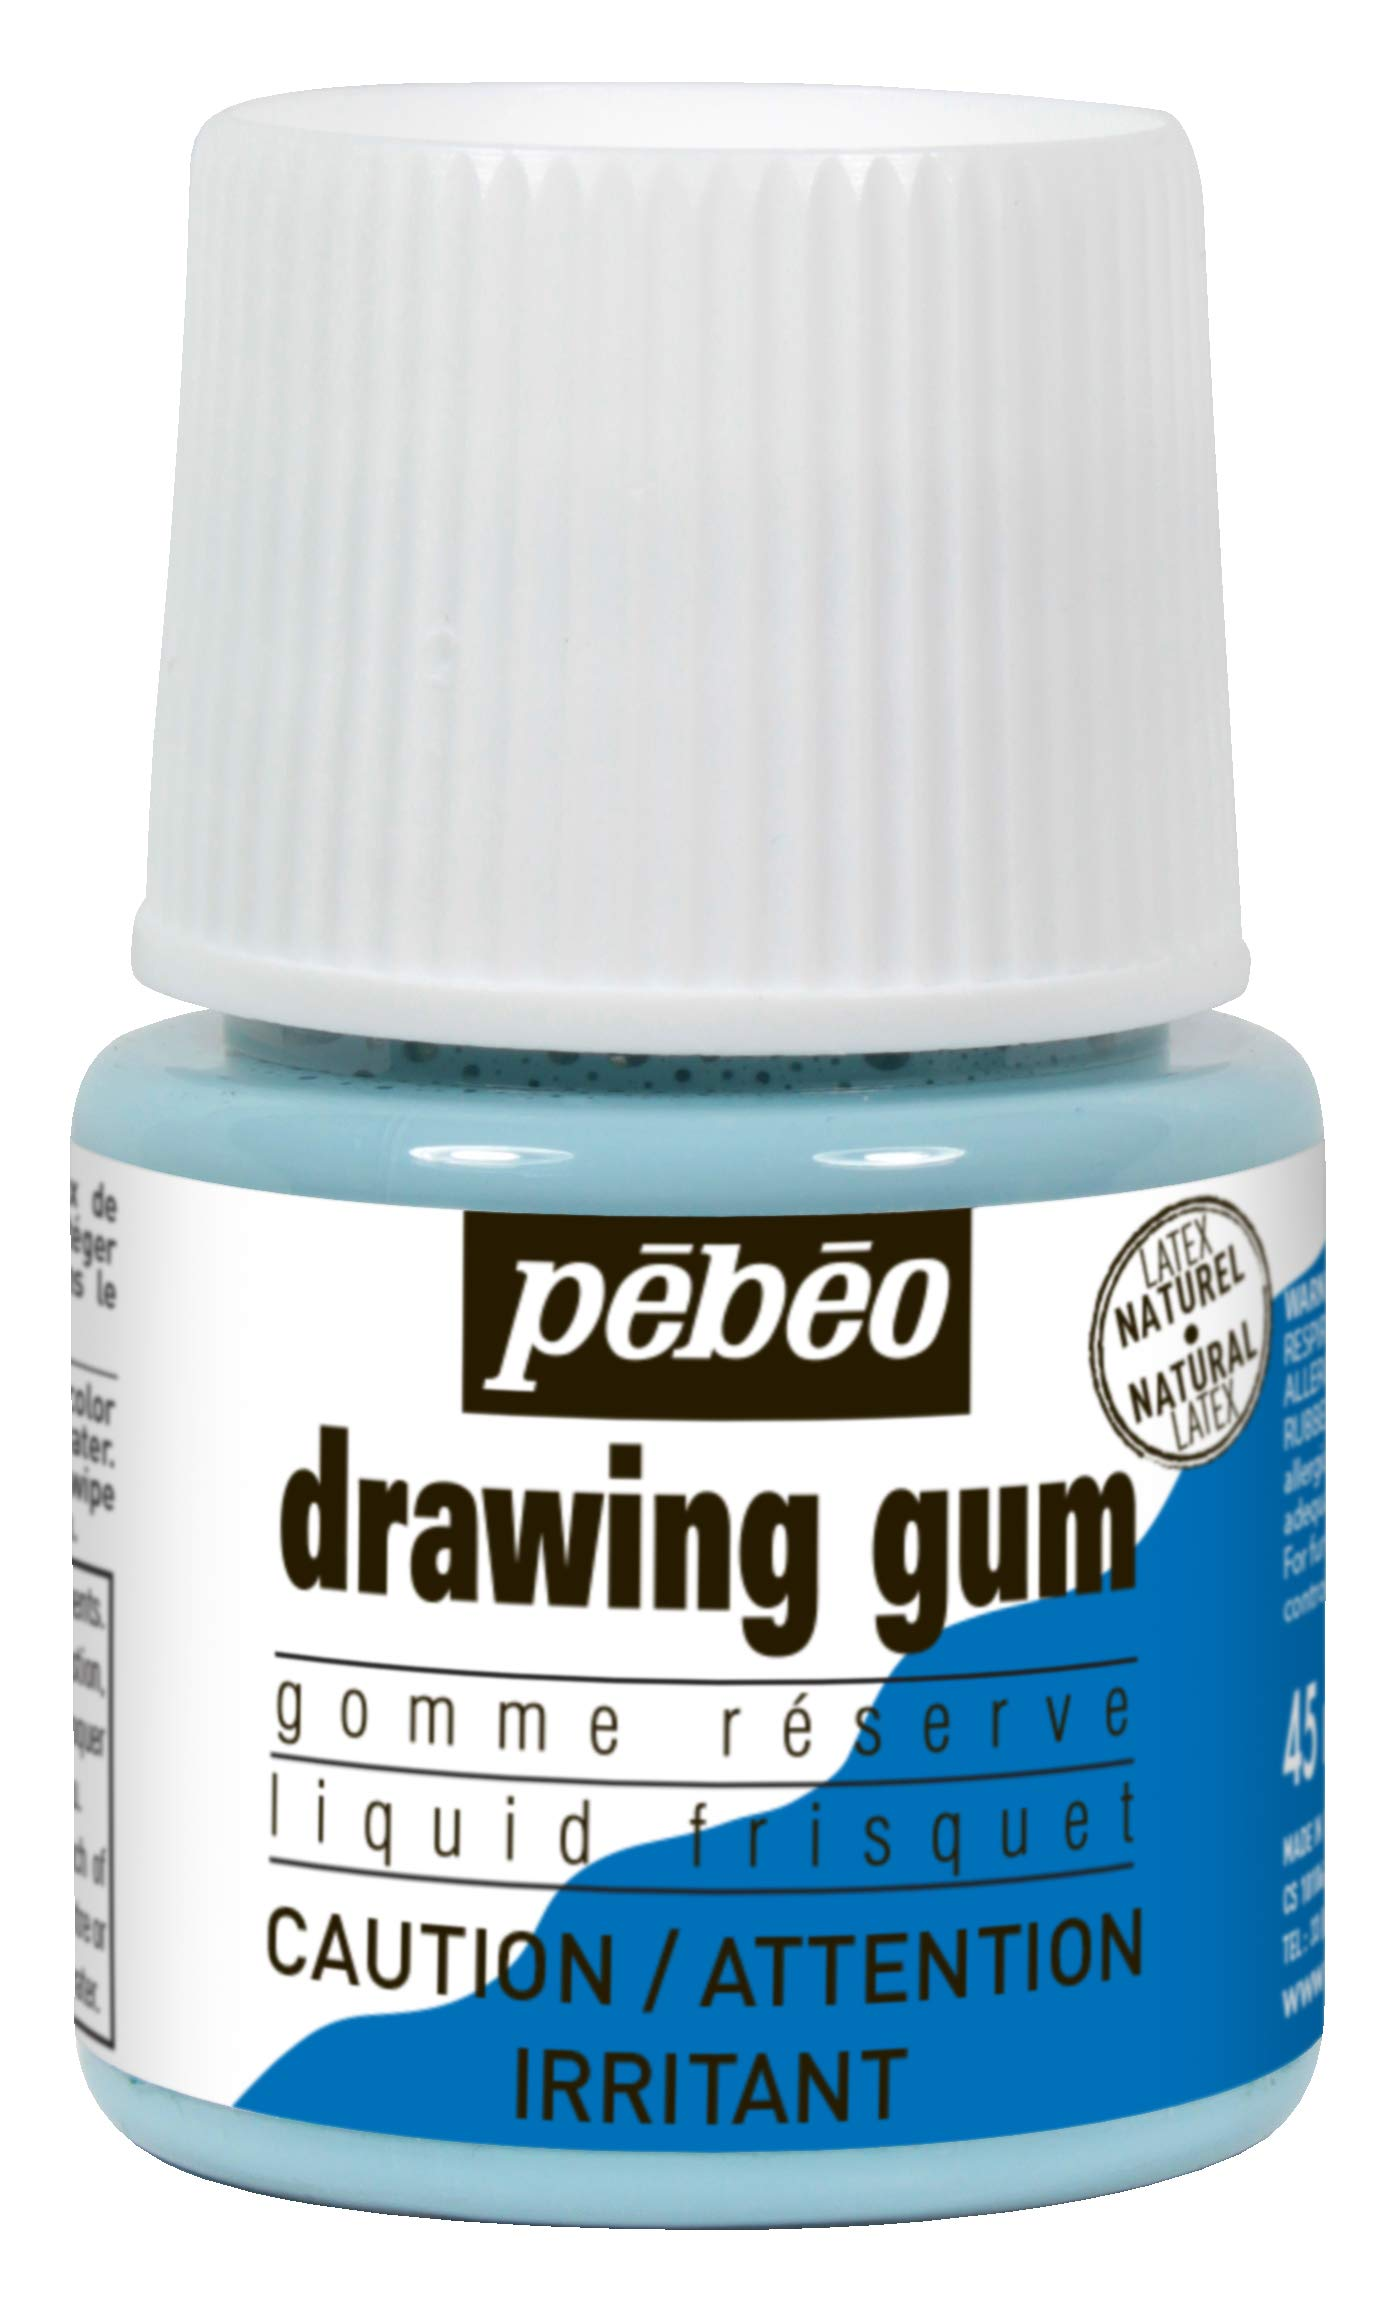 Pebeo Liquid Latex Masking Fluid Drawing Gum, 45ml/1.52oz Bottle